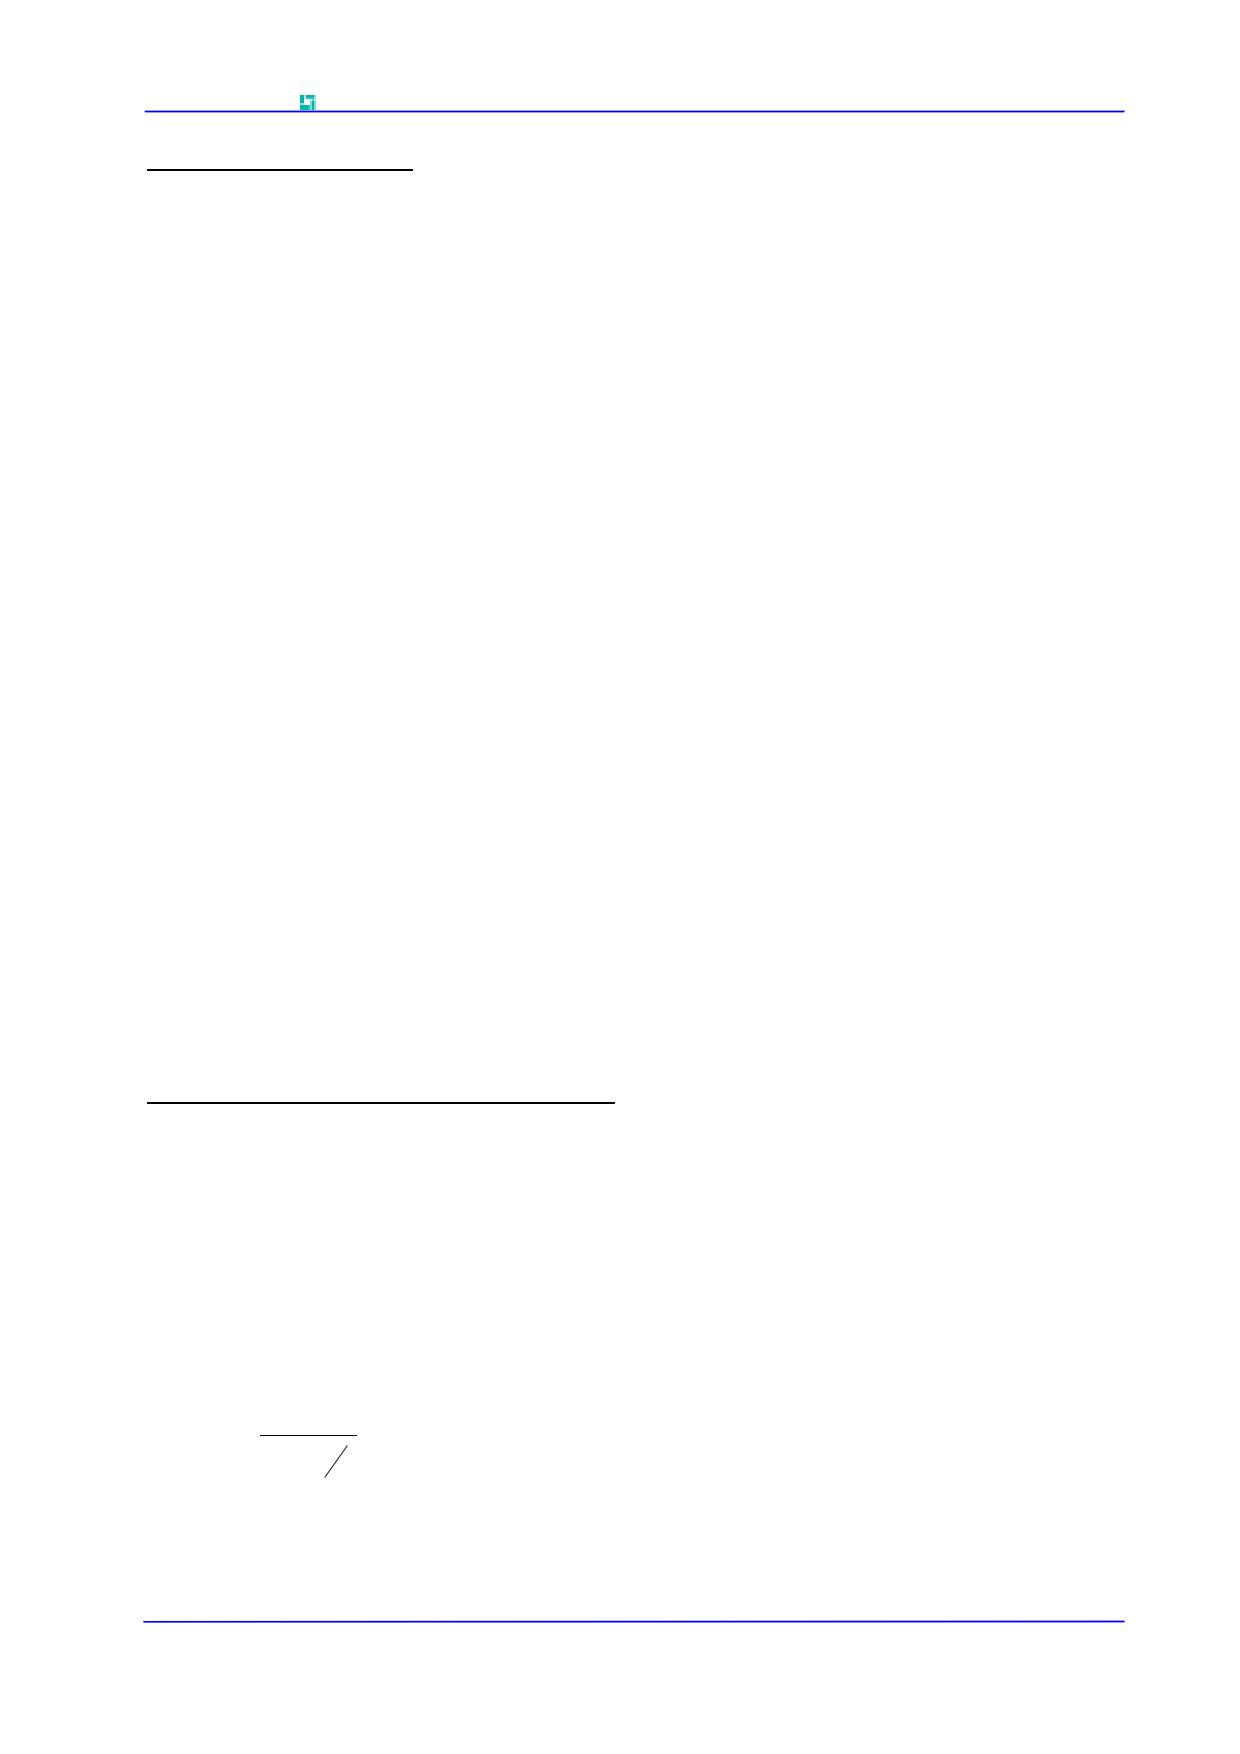 R0487YS12F pdf